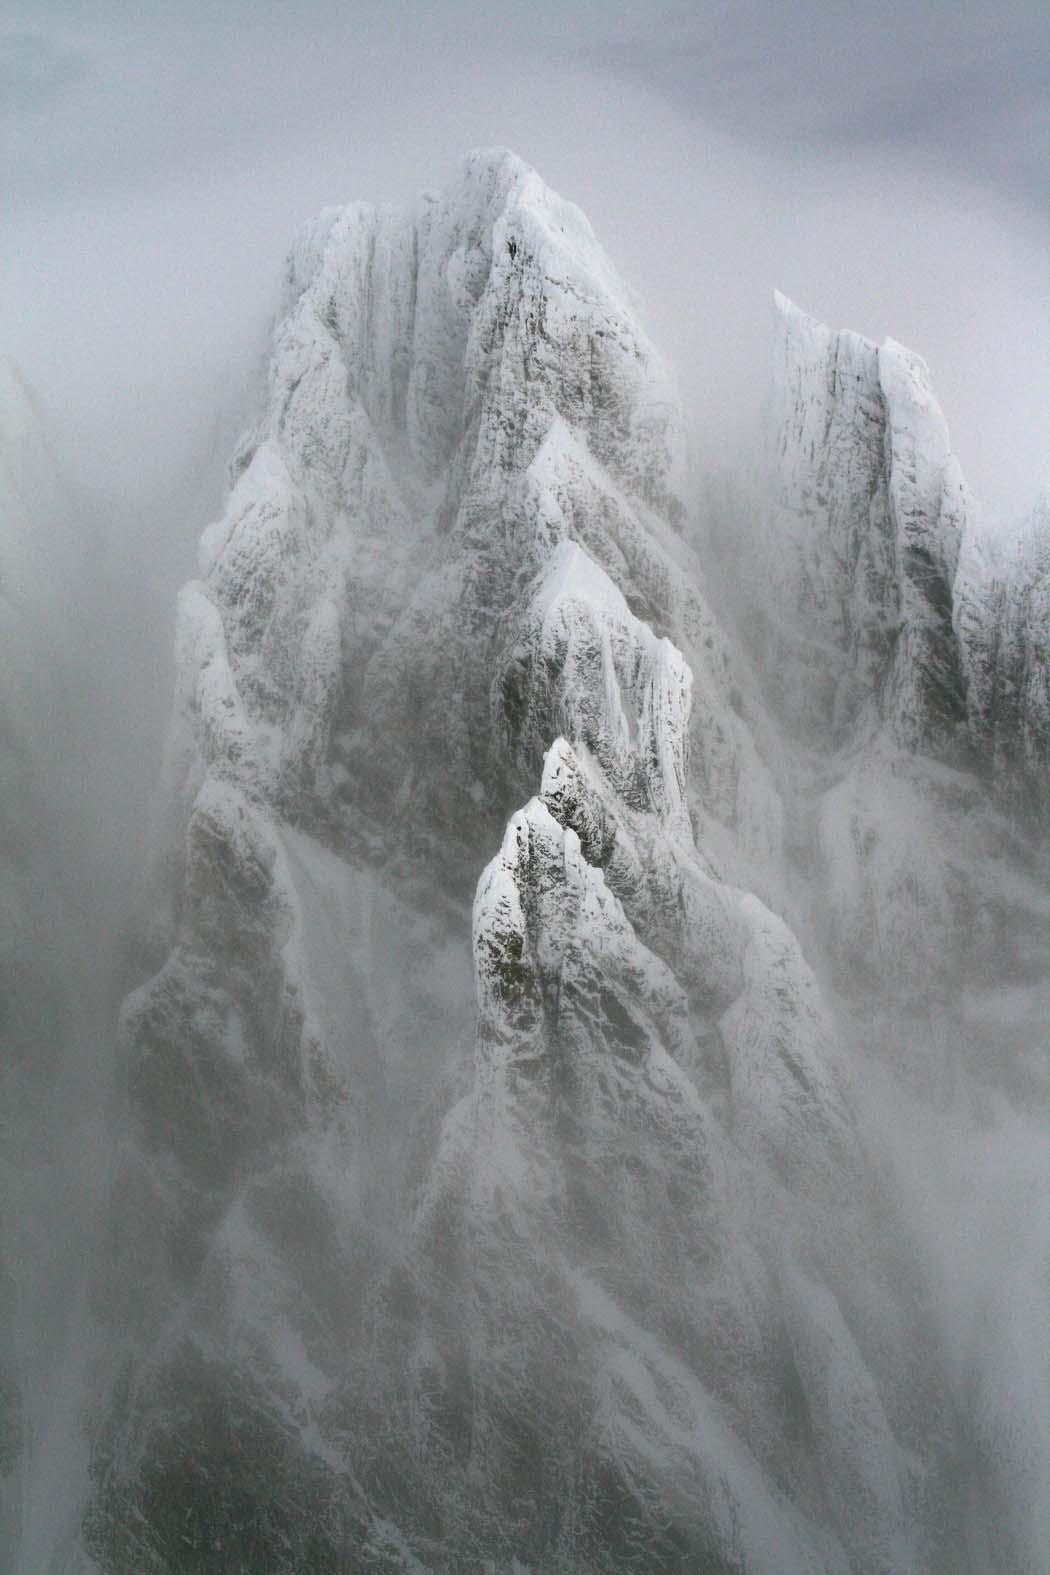 Waddington, Main Summit, South Face <br> (W122806--_0381.jpg)